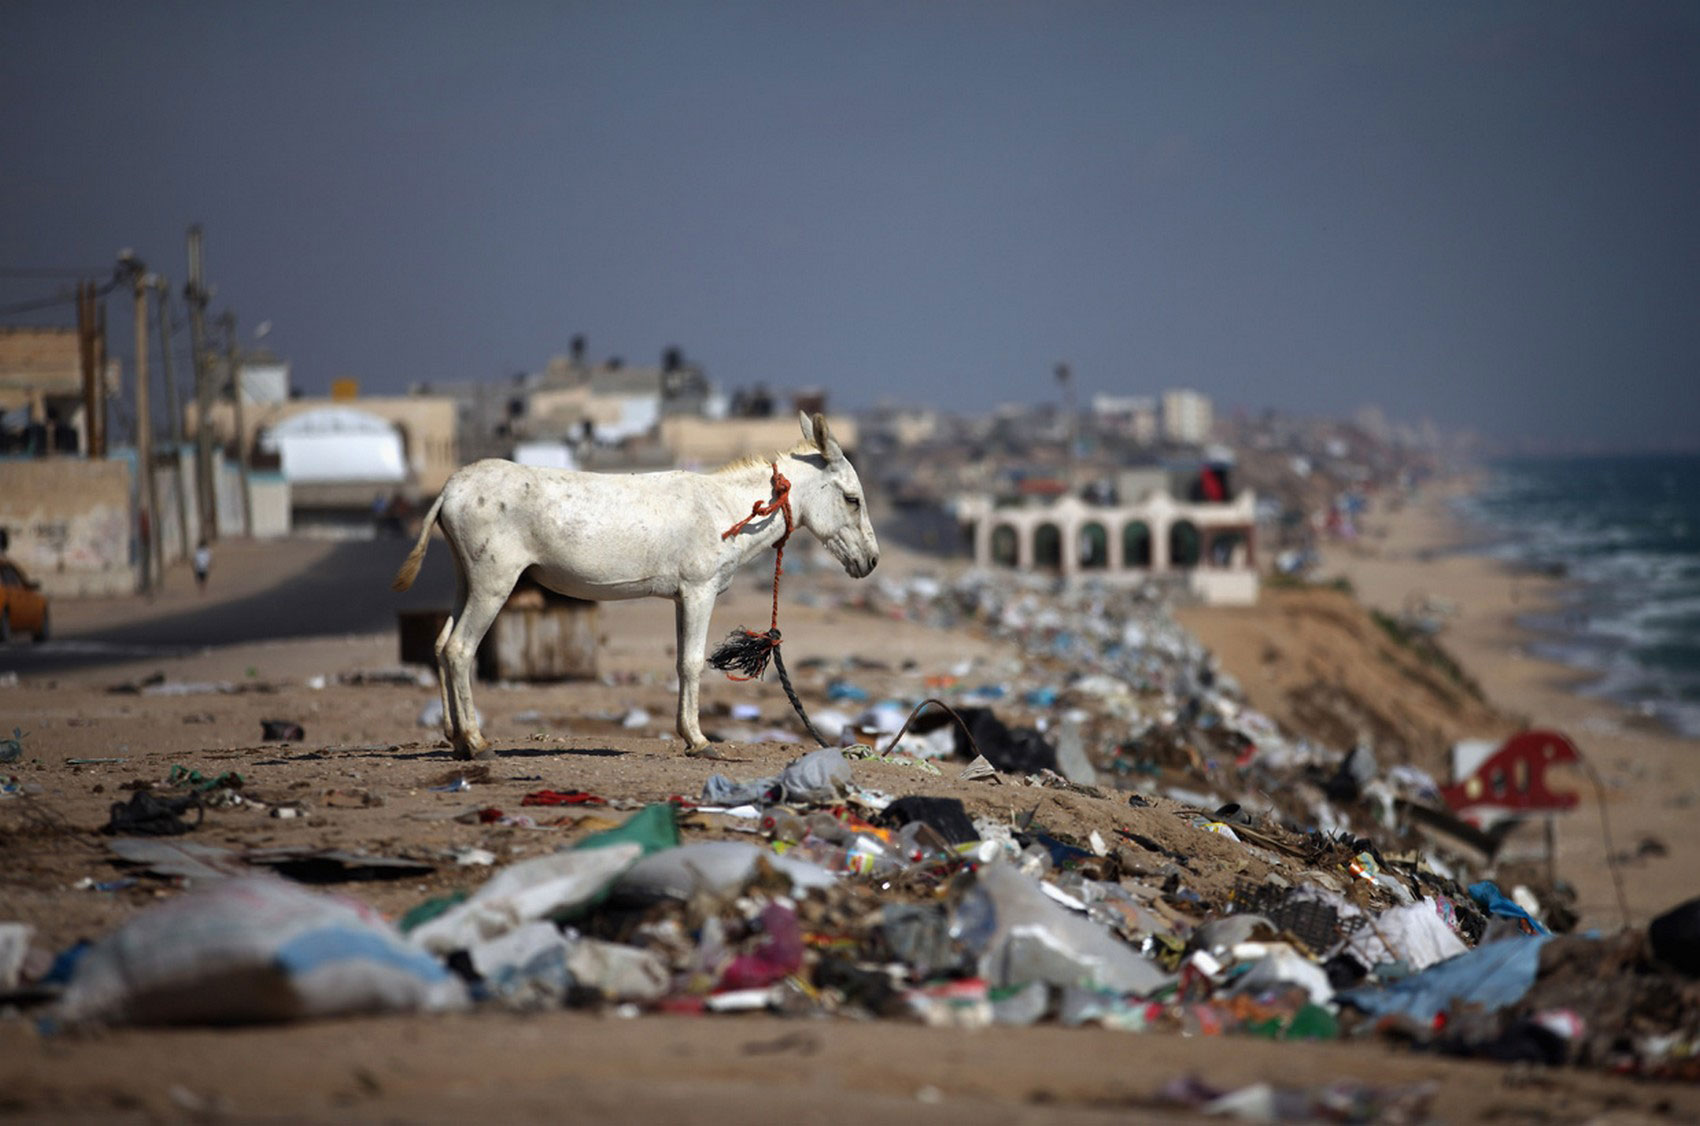 Осел среди кучи мусора, фото